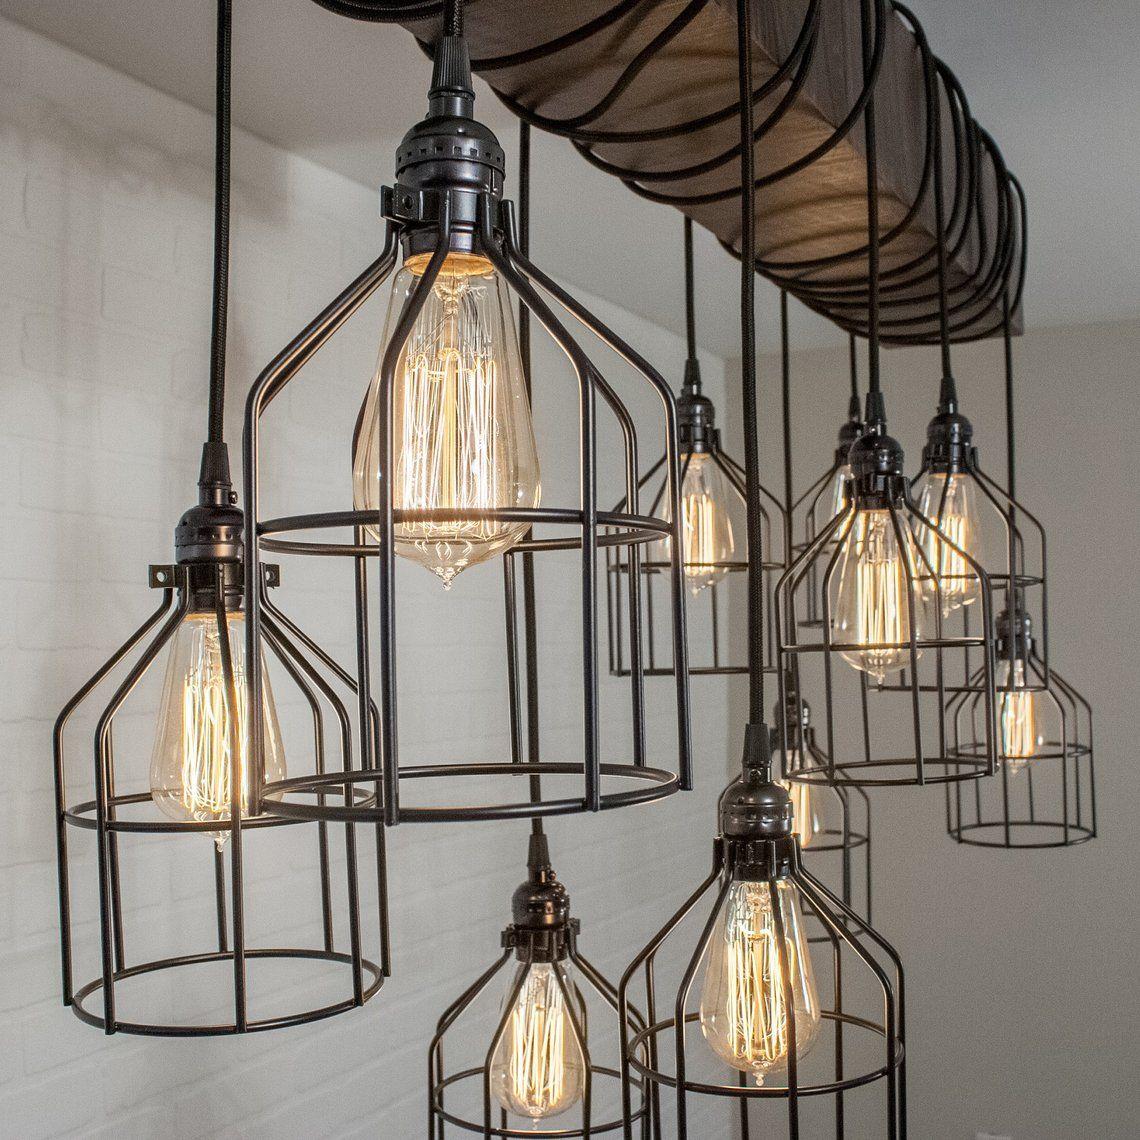 Wood Beam Light Industrial Lighting Fixture 10 Pendant